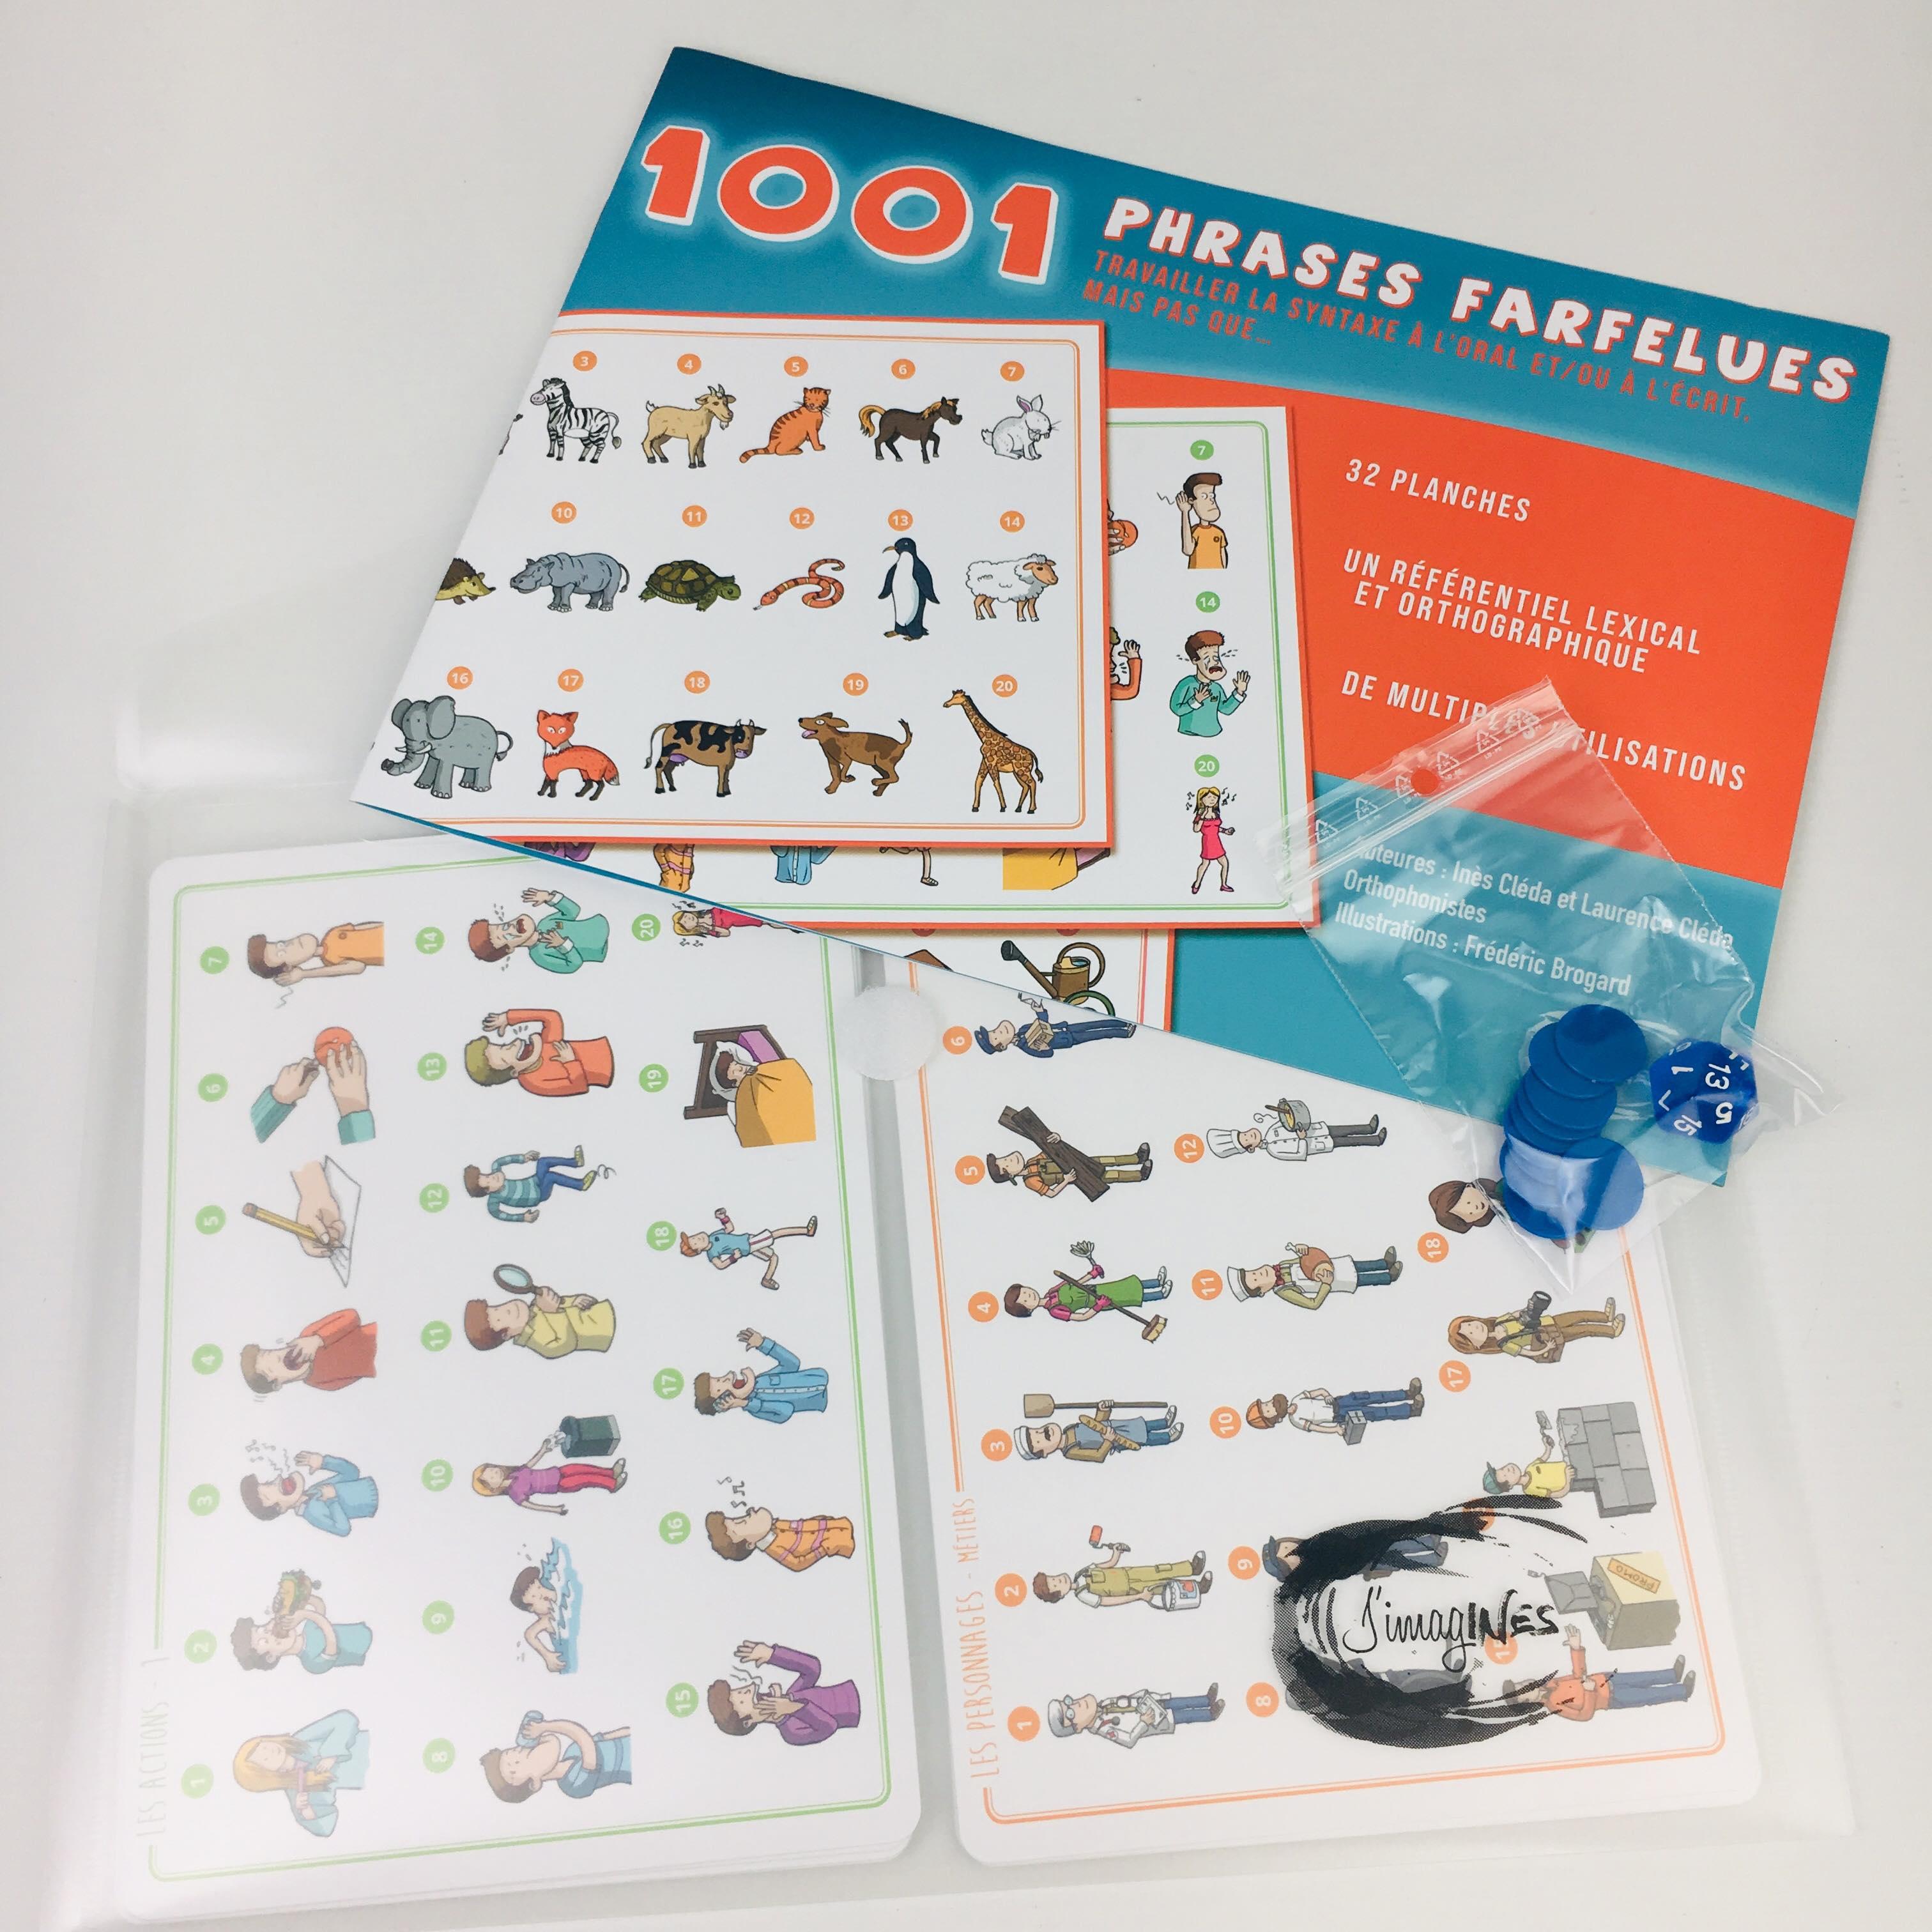 1001 phrases farfelues